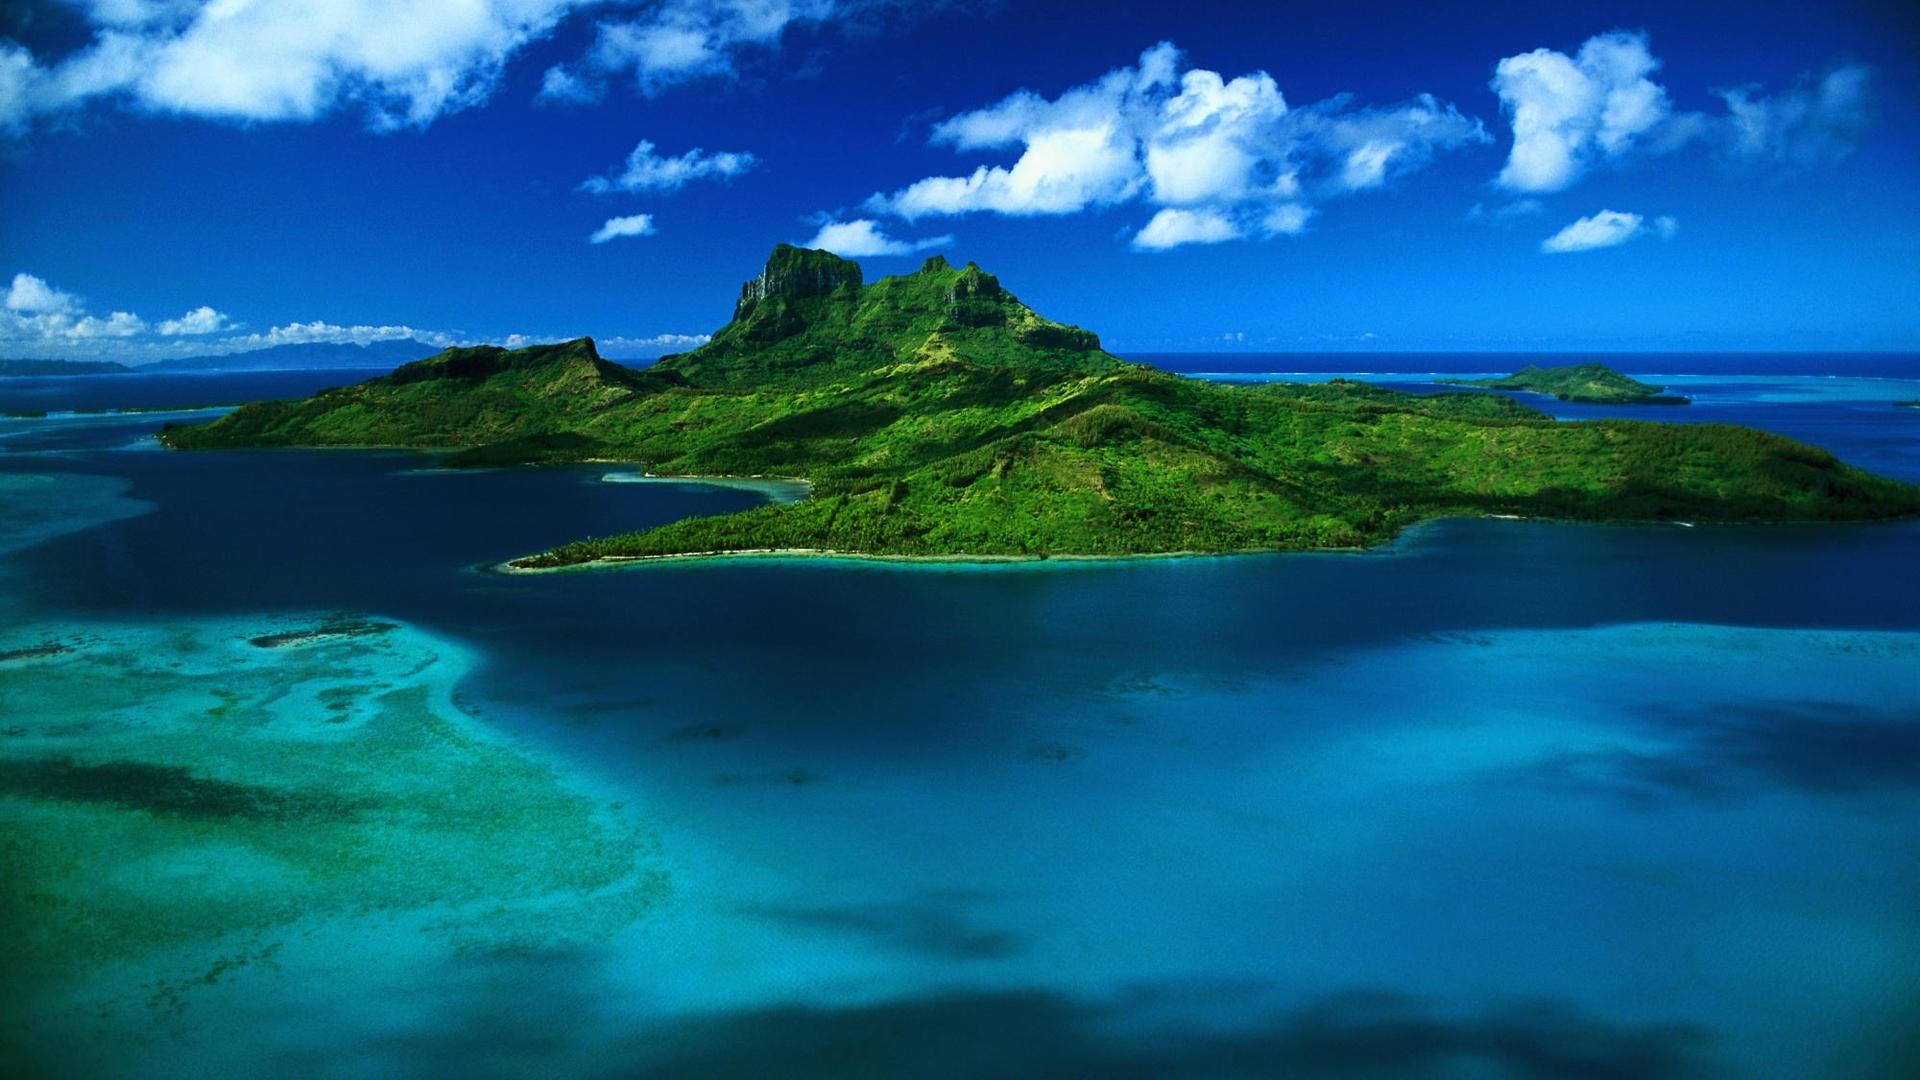 Ocean Nature Download Wallpaper